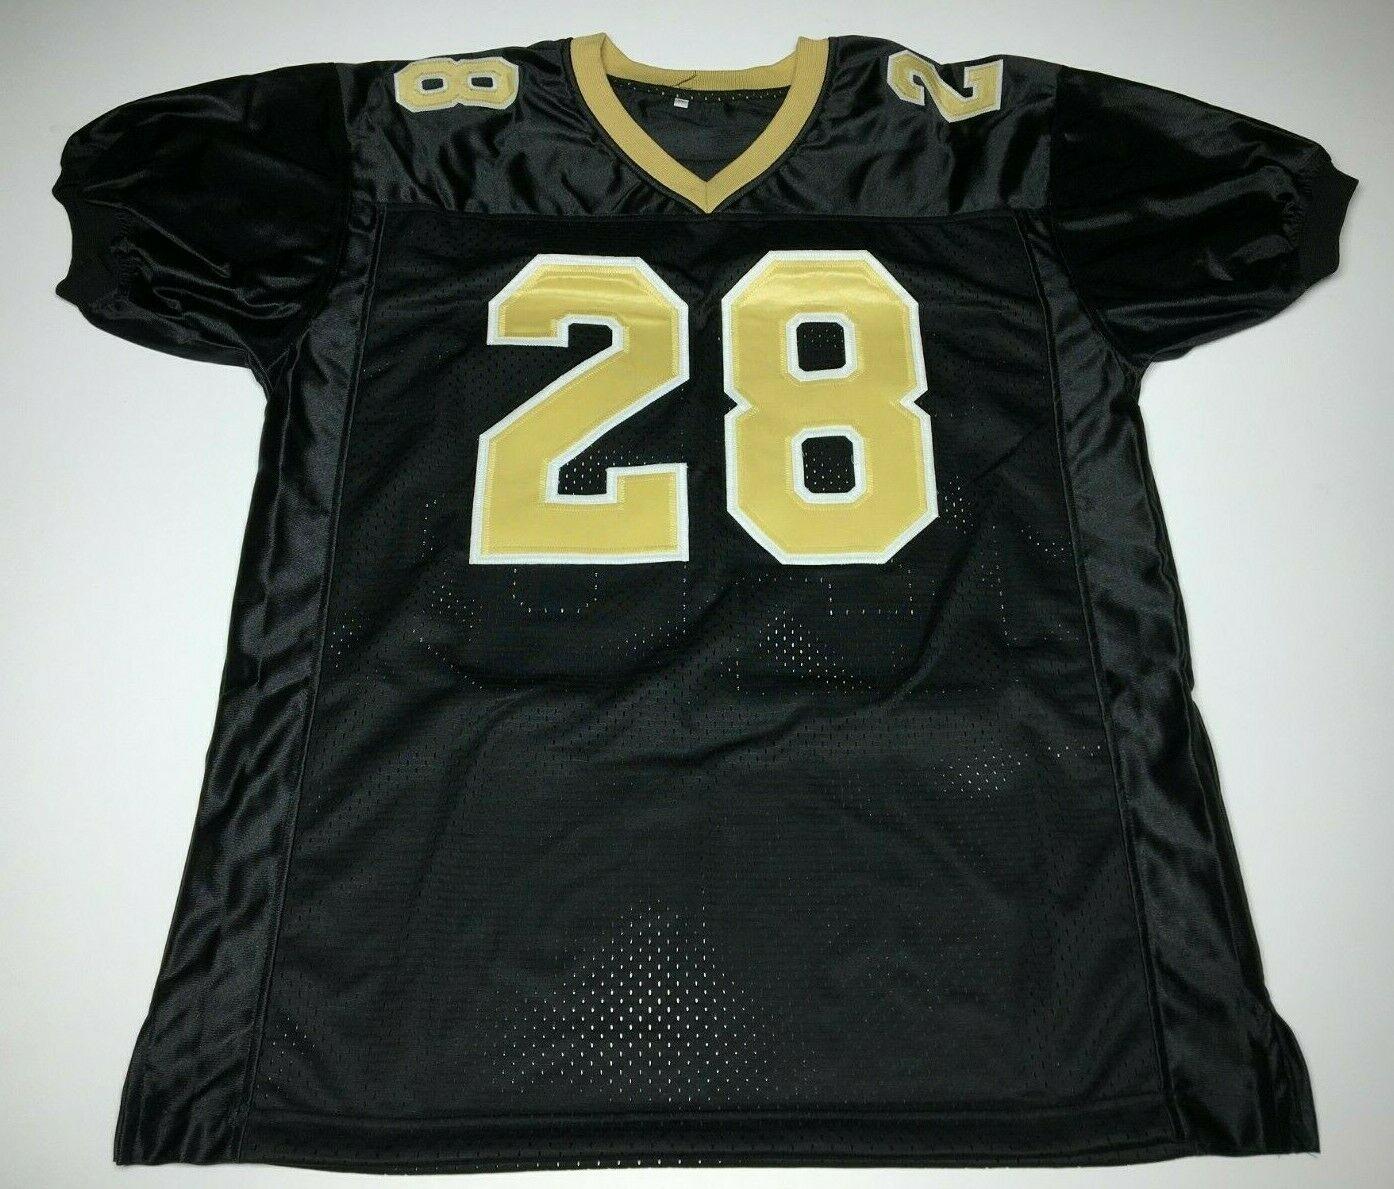 Mark Ingram Signed New Orleans Saints Football Jersey Tristar 7134155